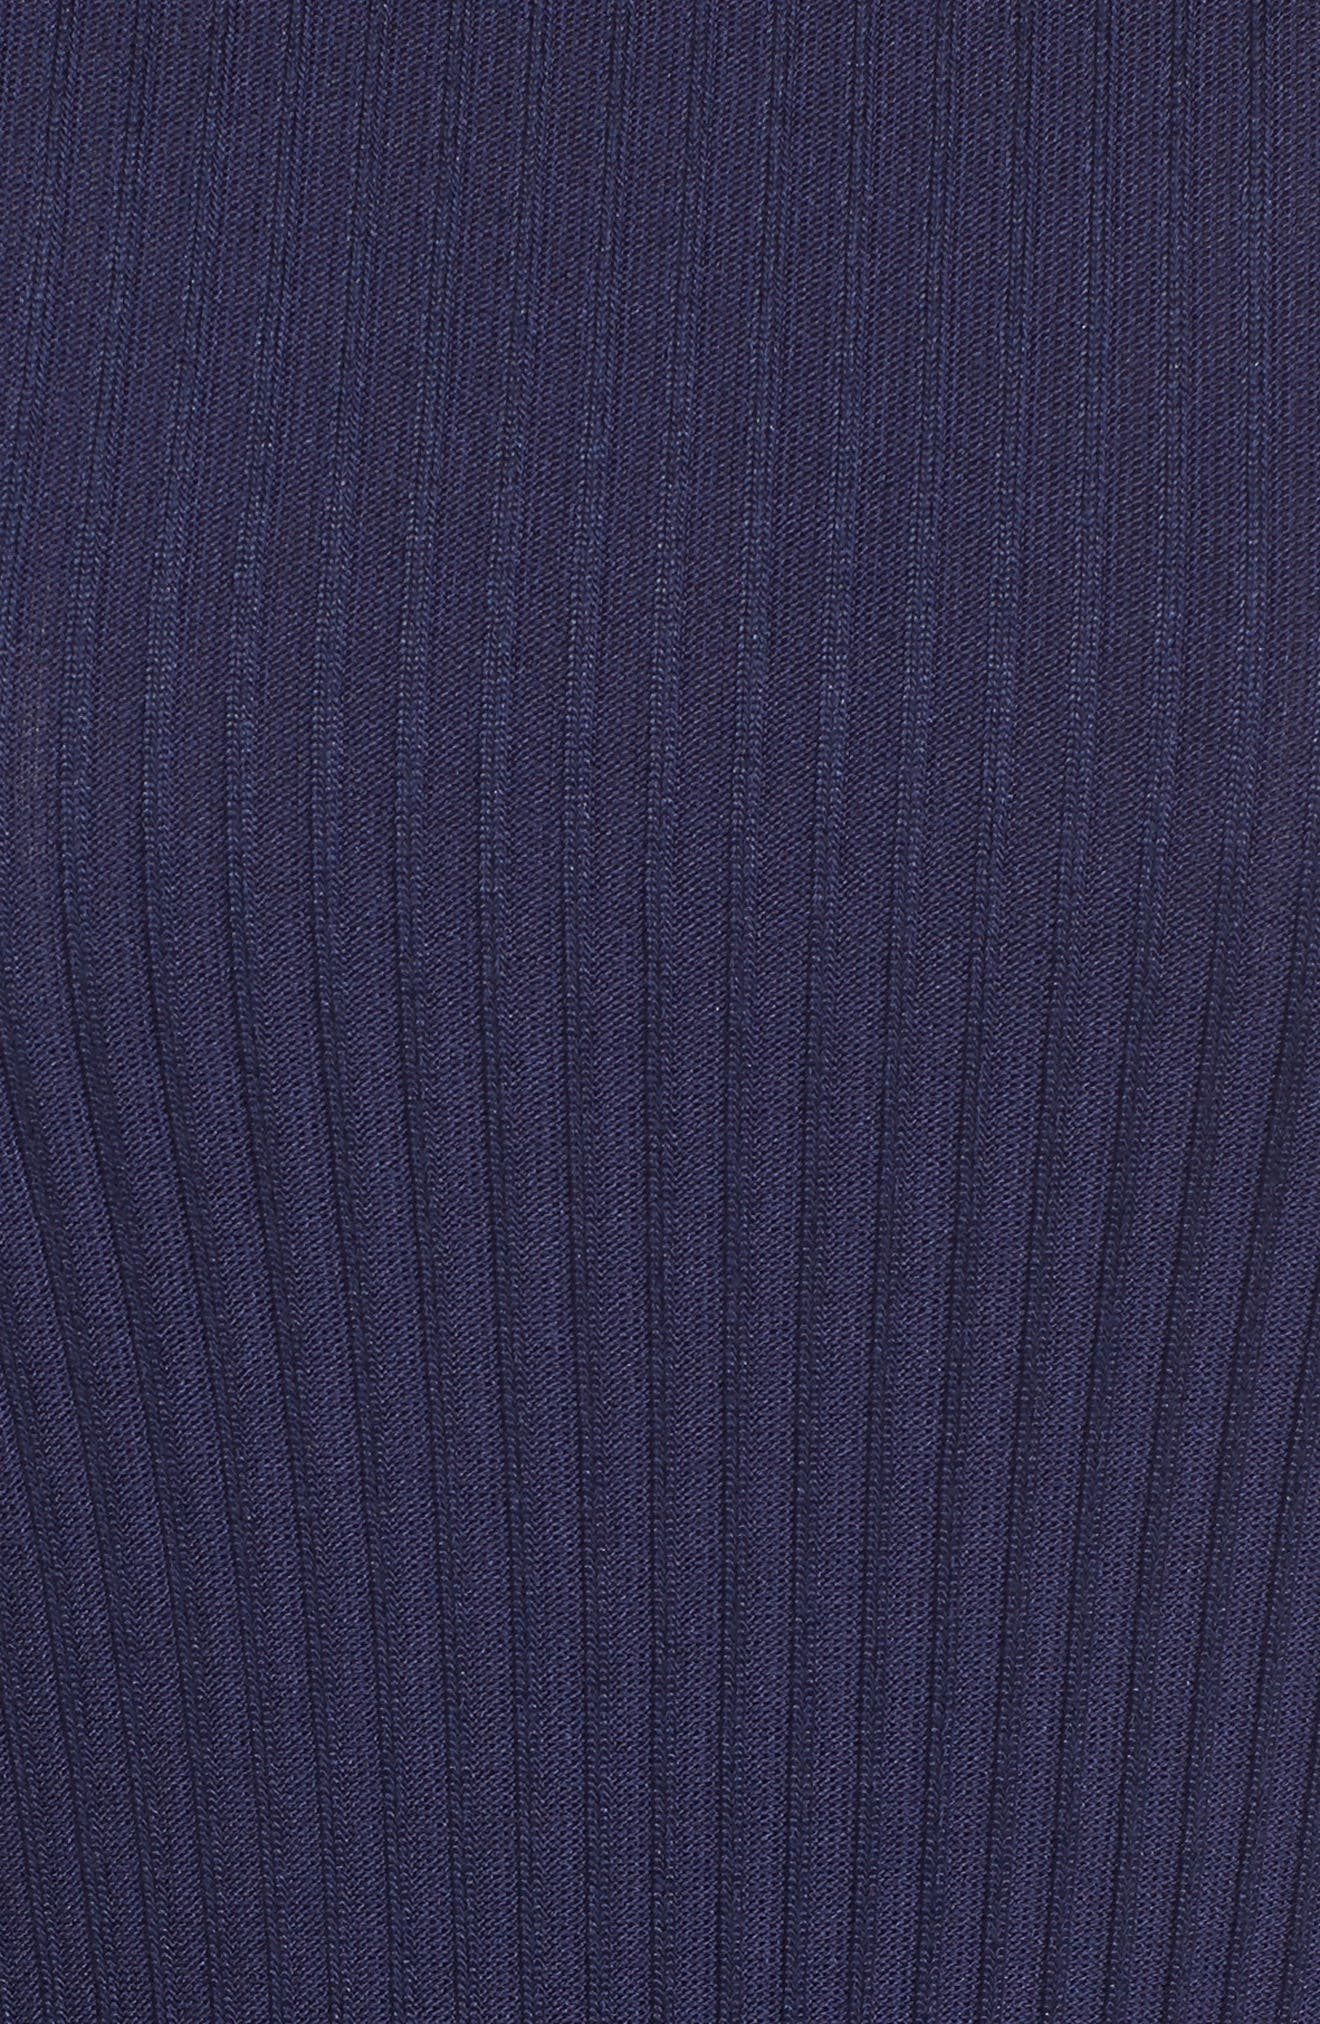 Ribbed Circle Trim Body-Con Dress,                             Alternate thumbnail 5, color,                             456